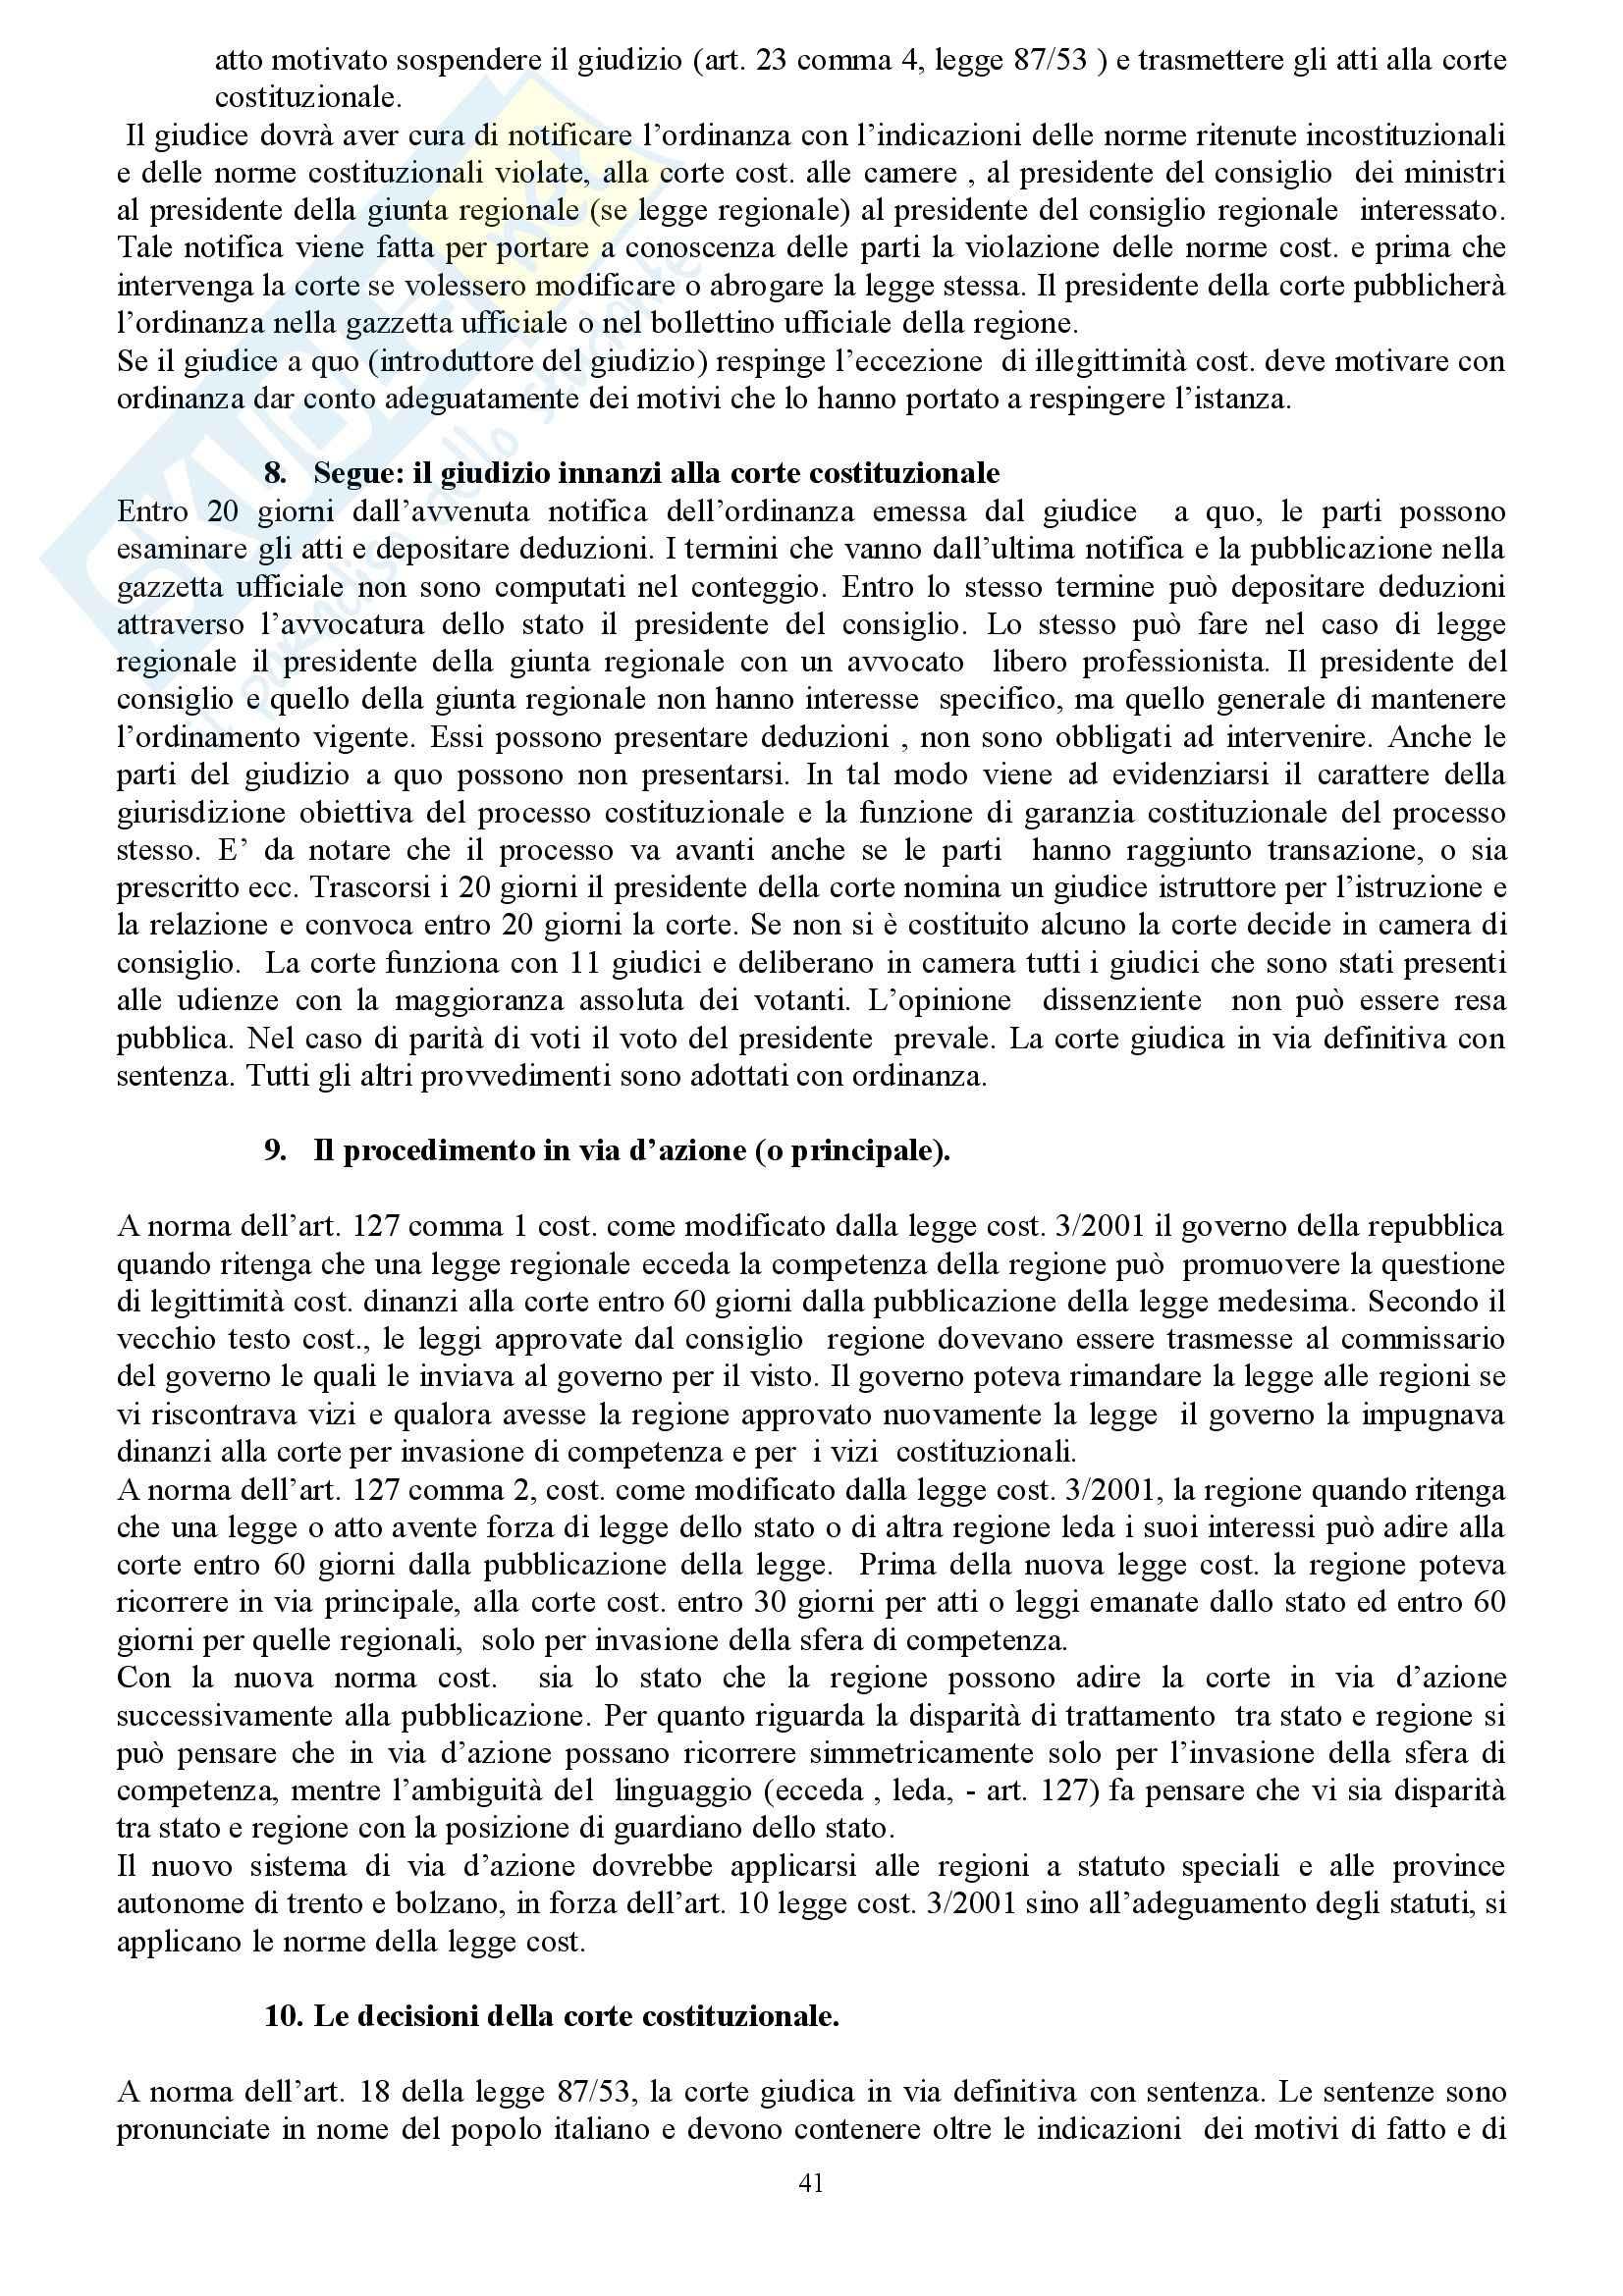 Riassunto esame Diritto Costituzionale, prof. indefinito, libro consigliato Diritto Costituzionale, Martines Pag. 41